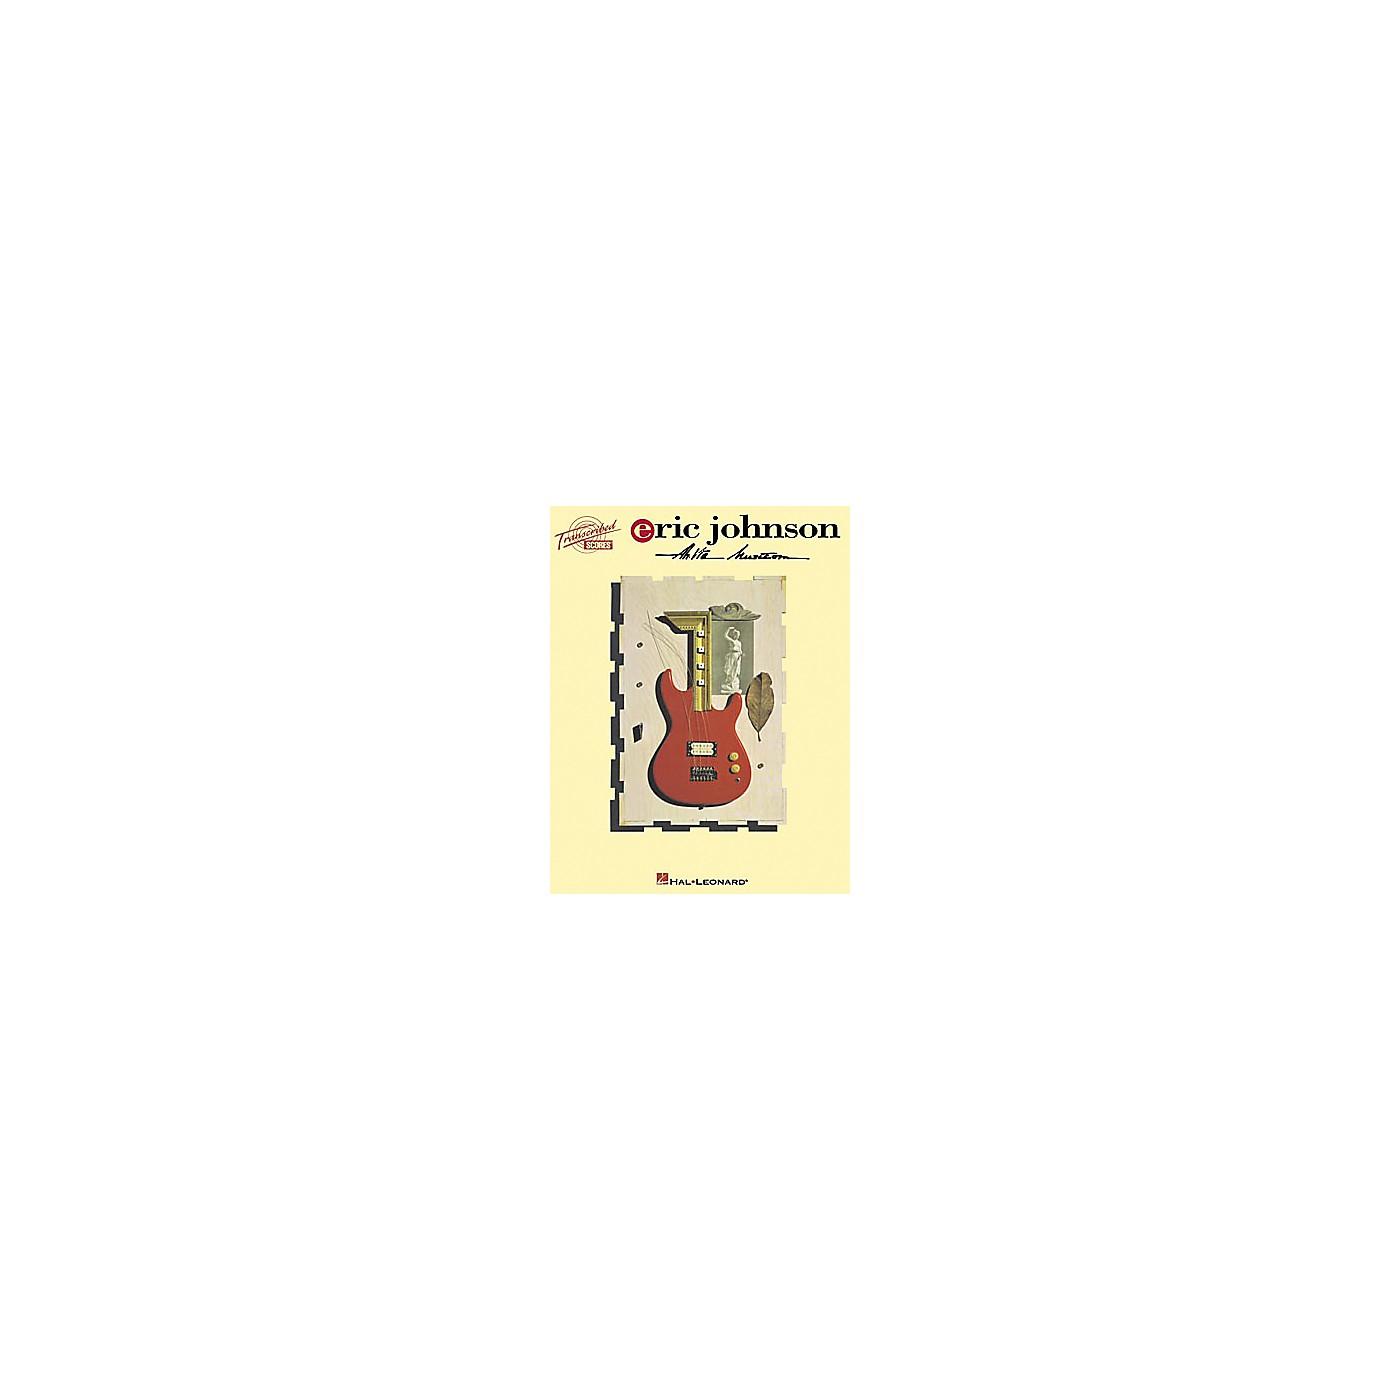 Hal Leonard Eric Johnson - Ah Via Musicom Transcribed Score Book thumbnail